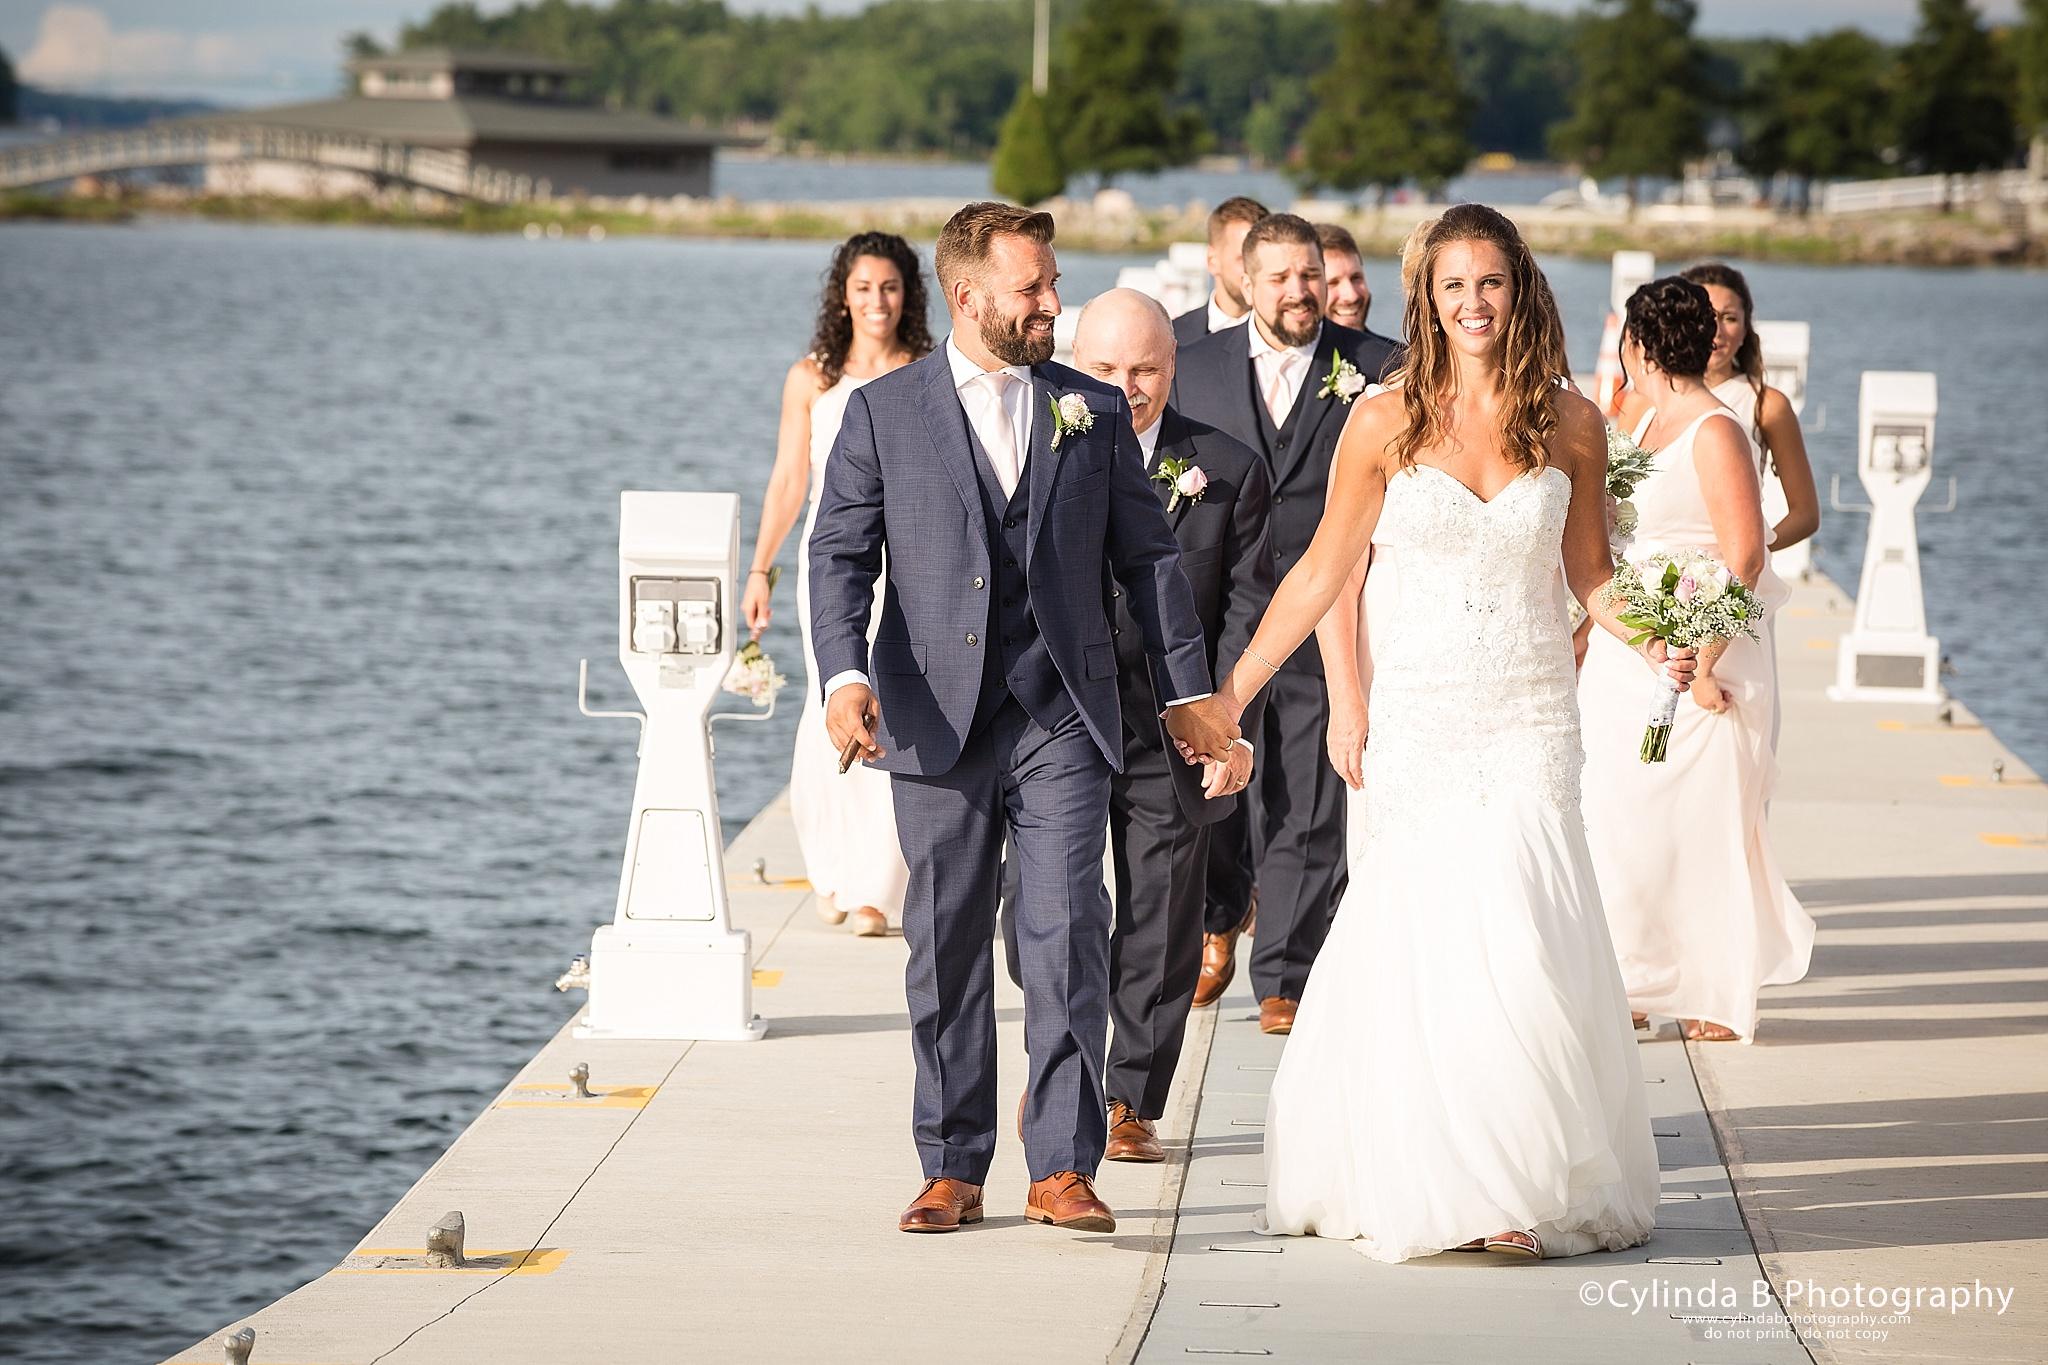 Boldt Castle Wedding, Alexandria Bay, Wedding, Photograper, Cylinda B Photography-34